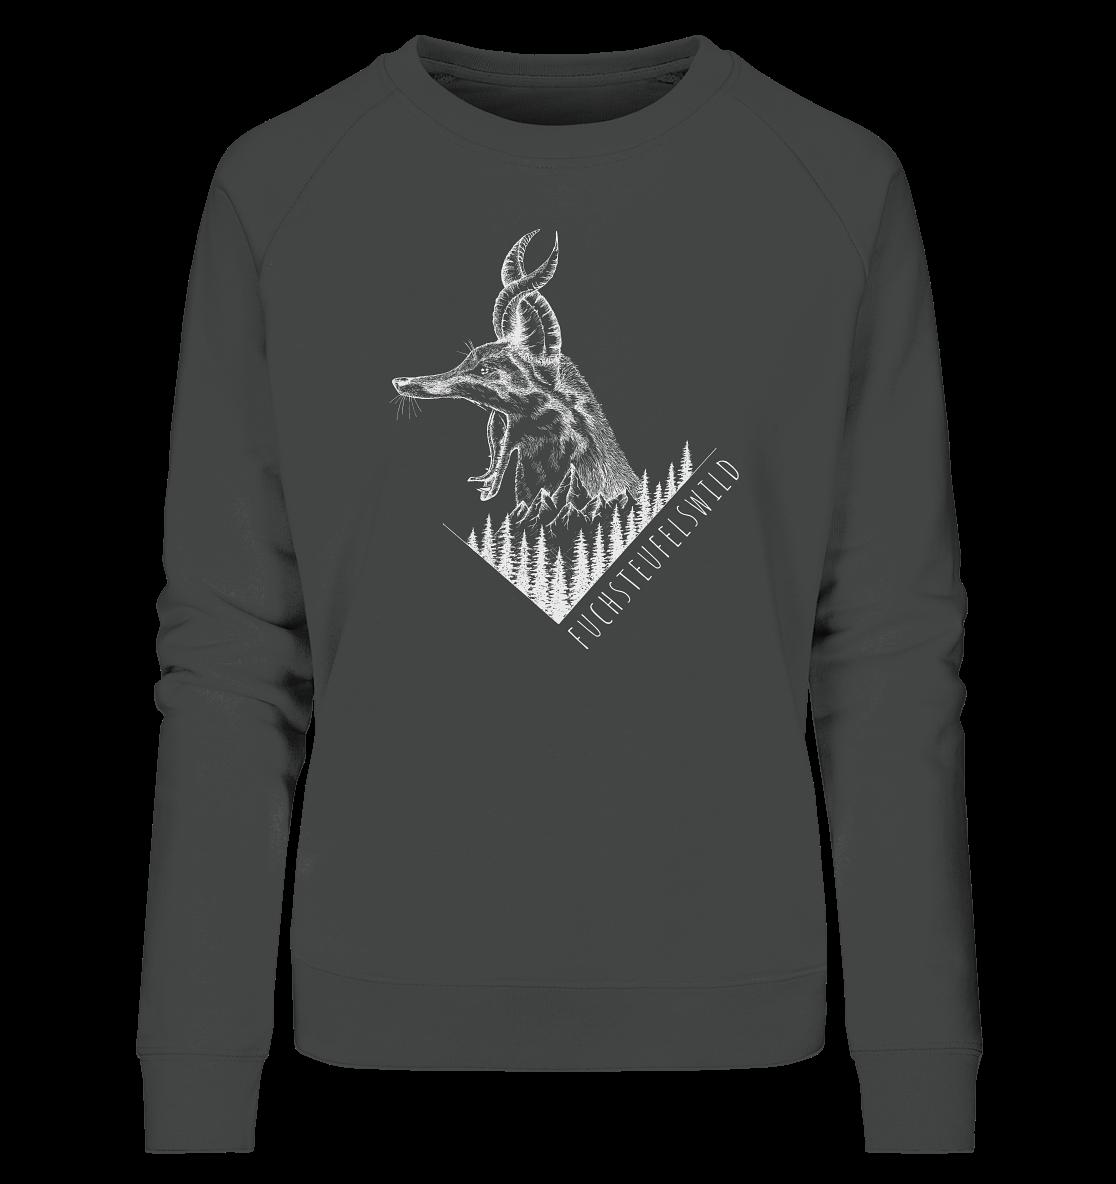 front-ladies-organic-sweatshirt-444545-1116x-3.png